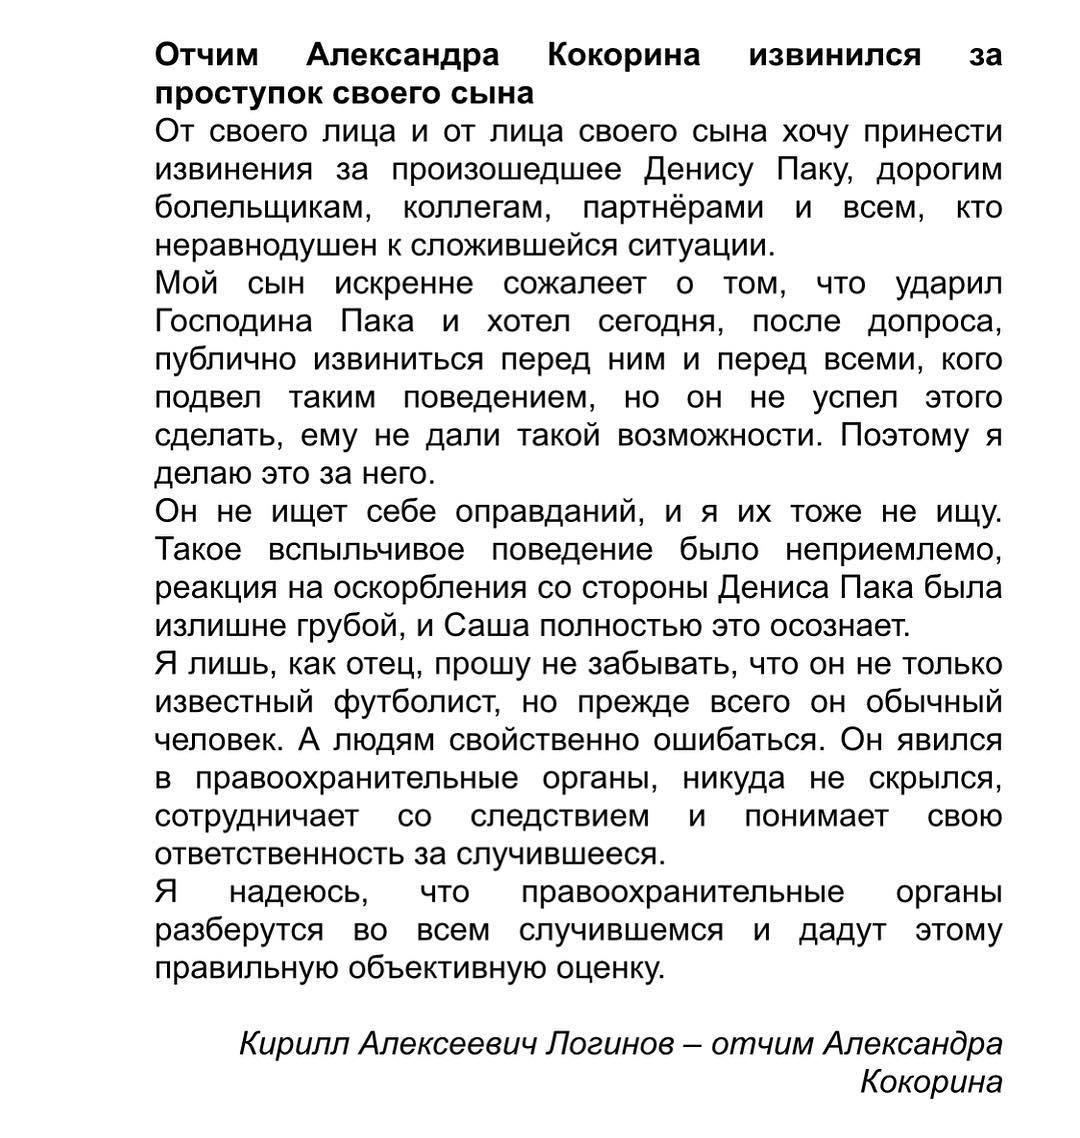 Отчим Кокорина официально извинился за футболиста перед чиновником